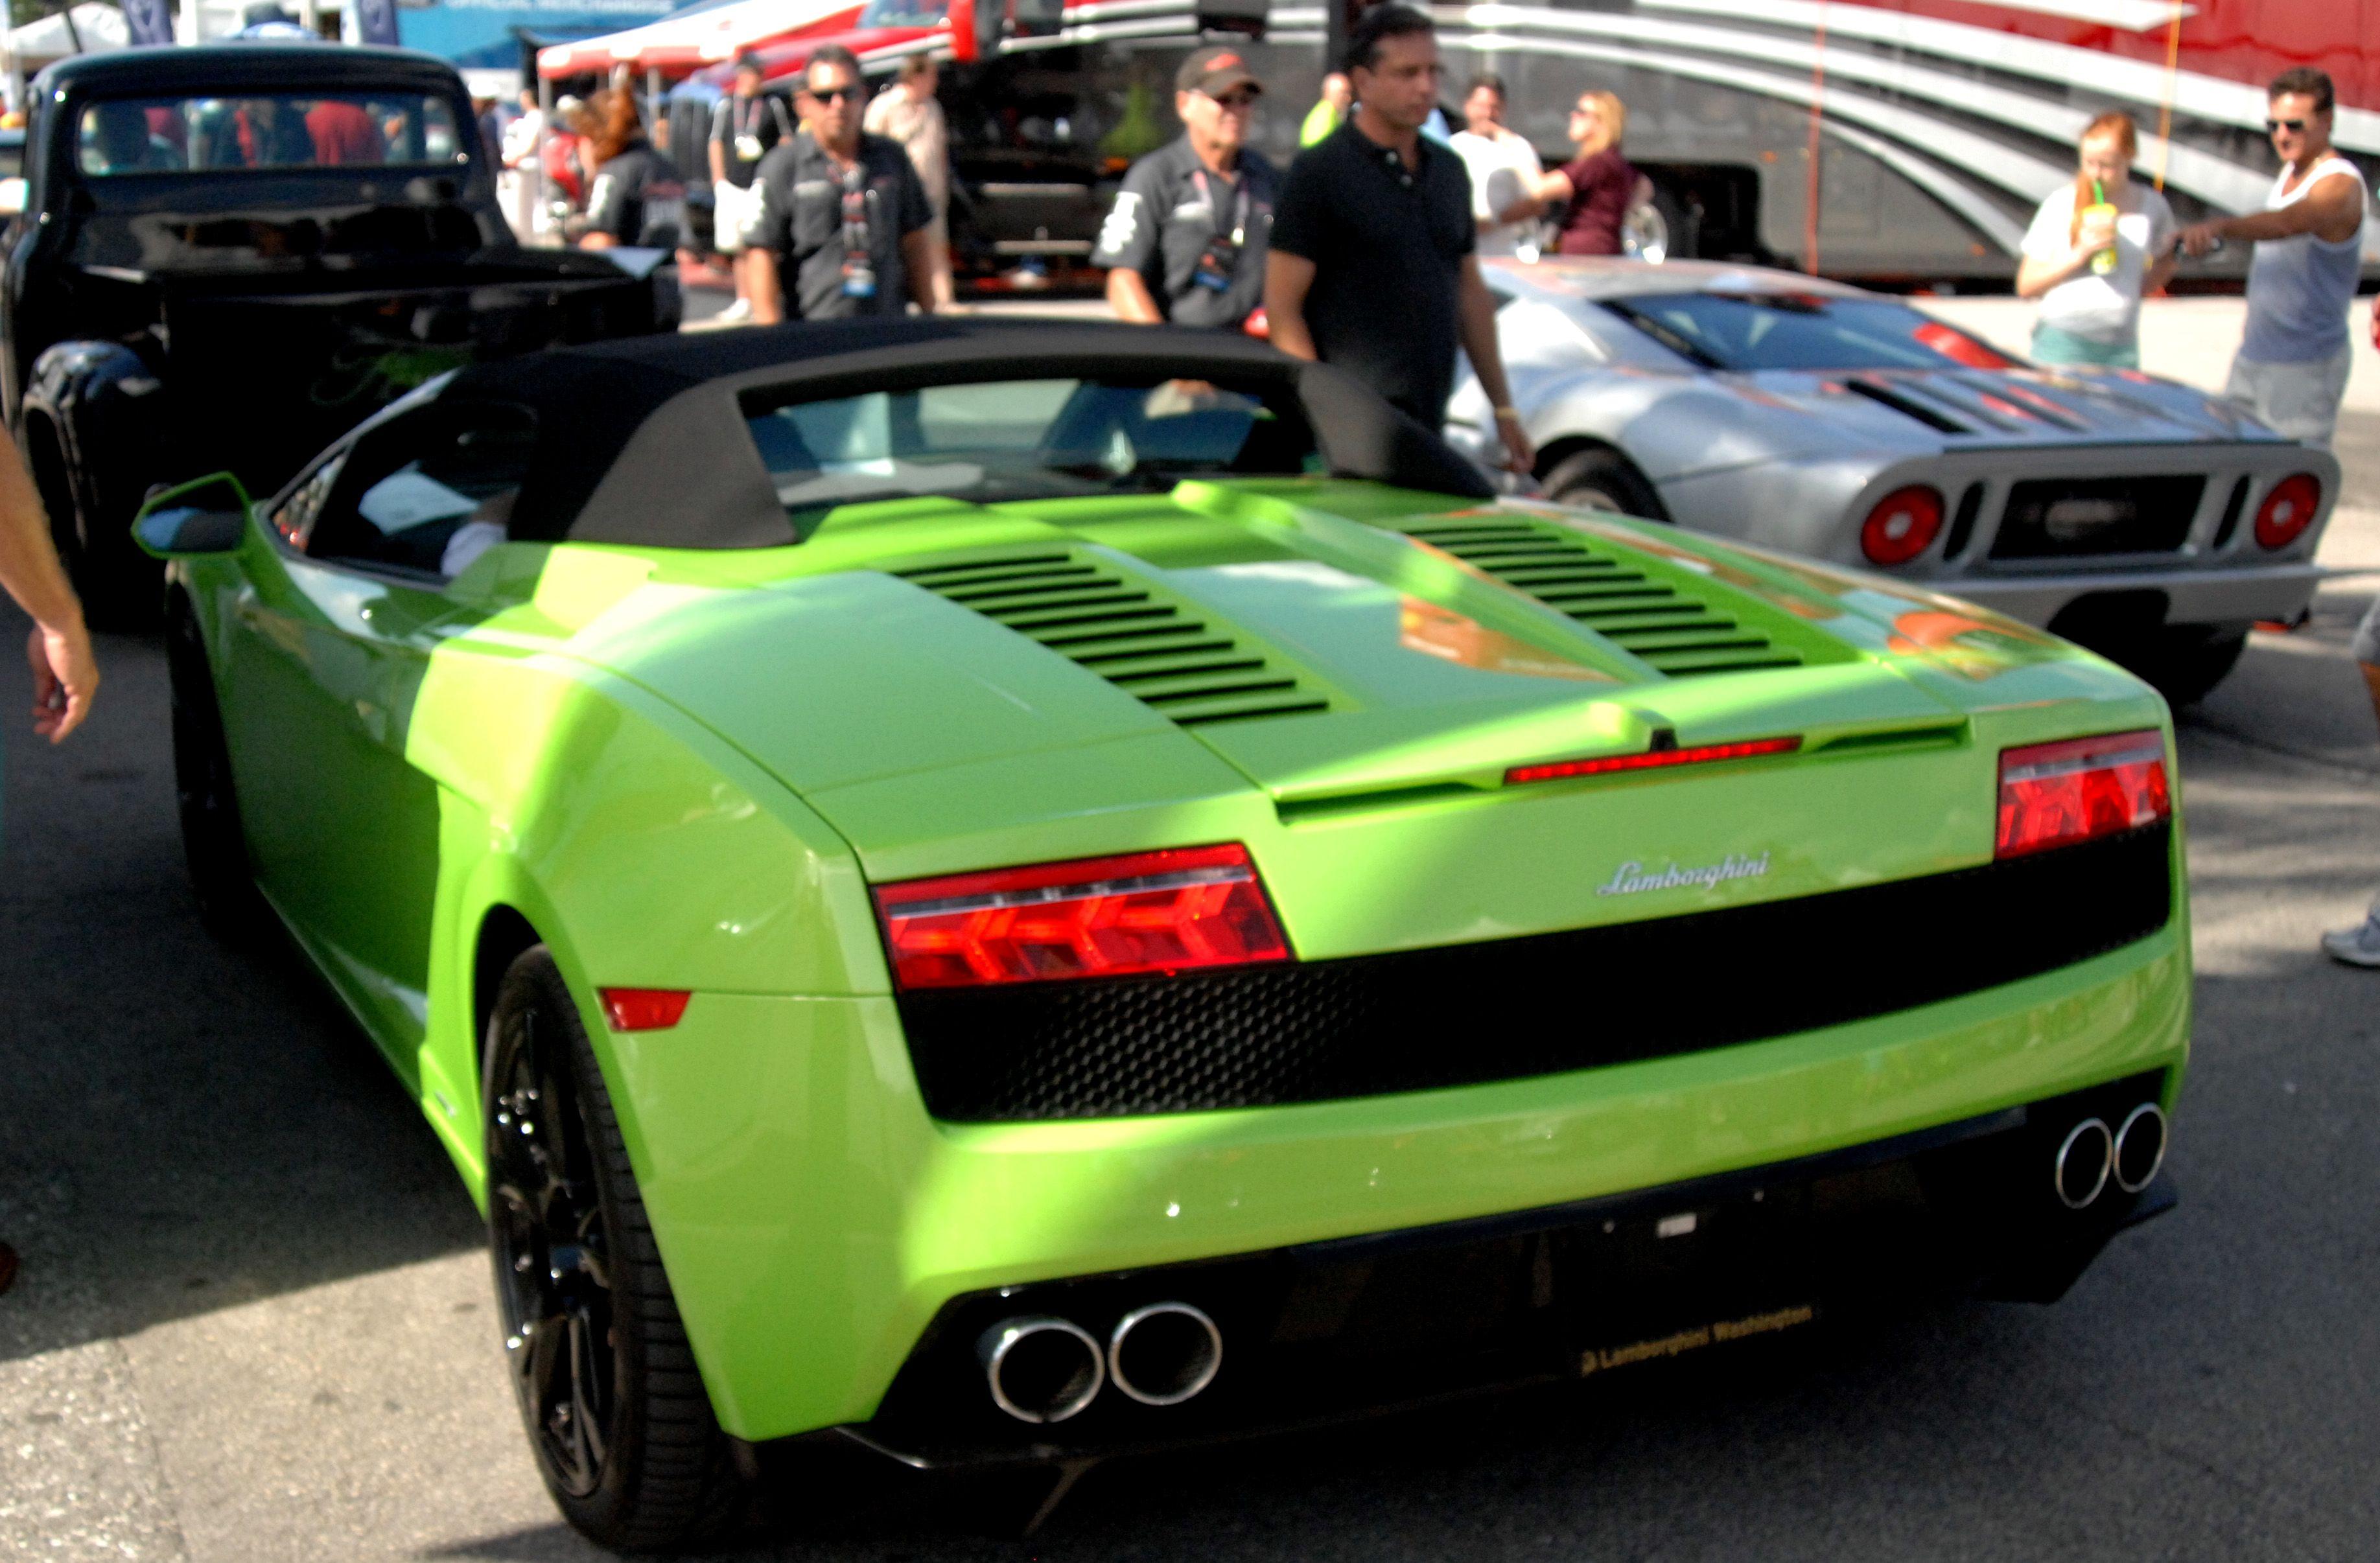 radka blog lamborghini photos news s gallardo specs price makes car